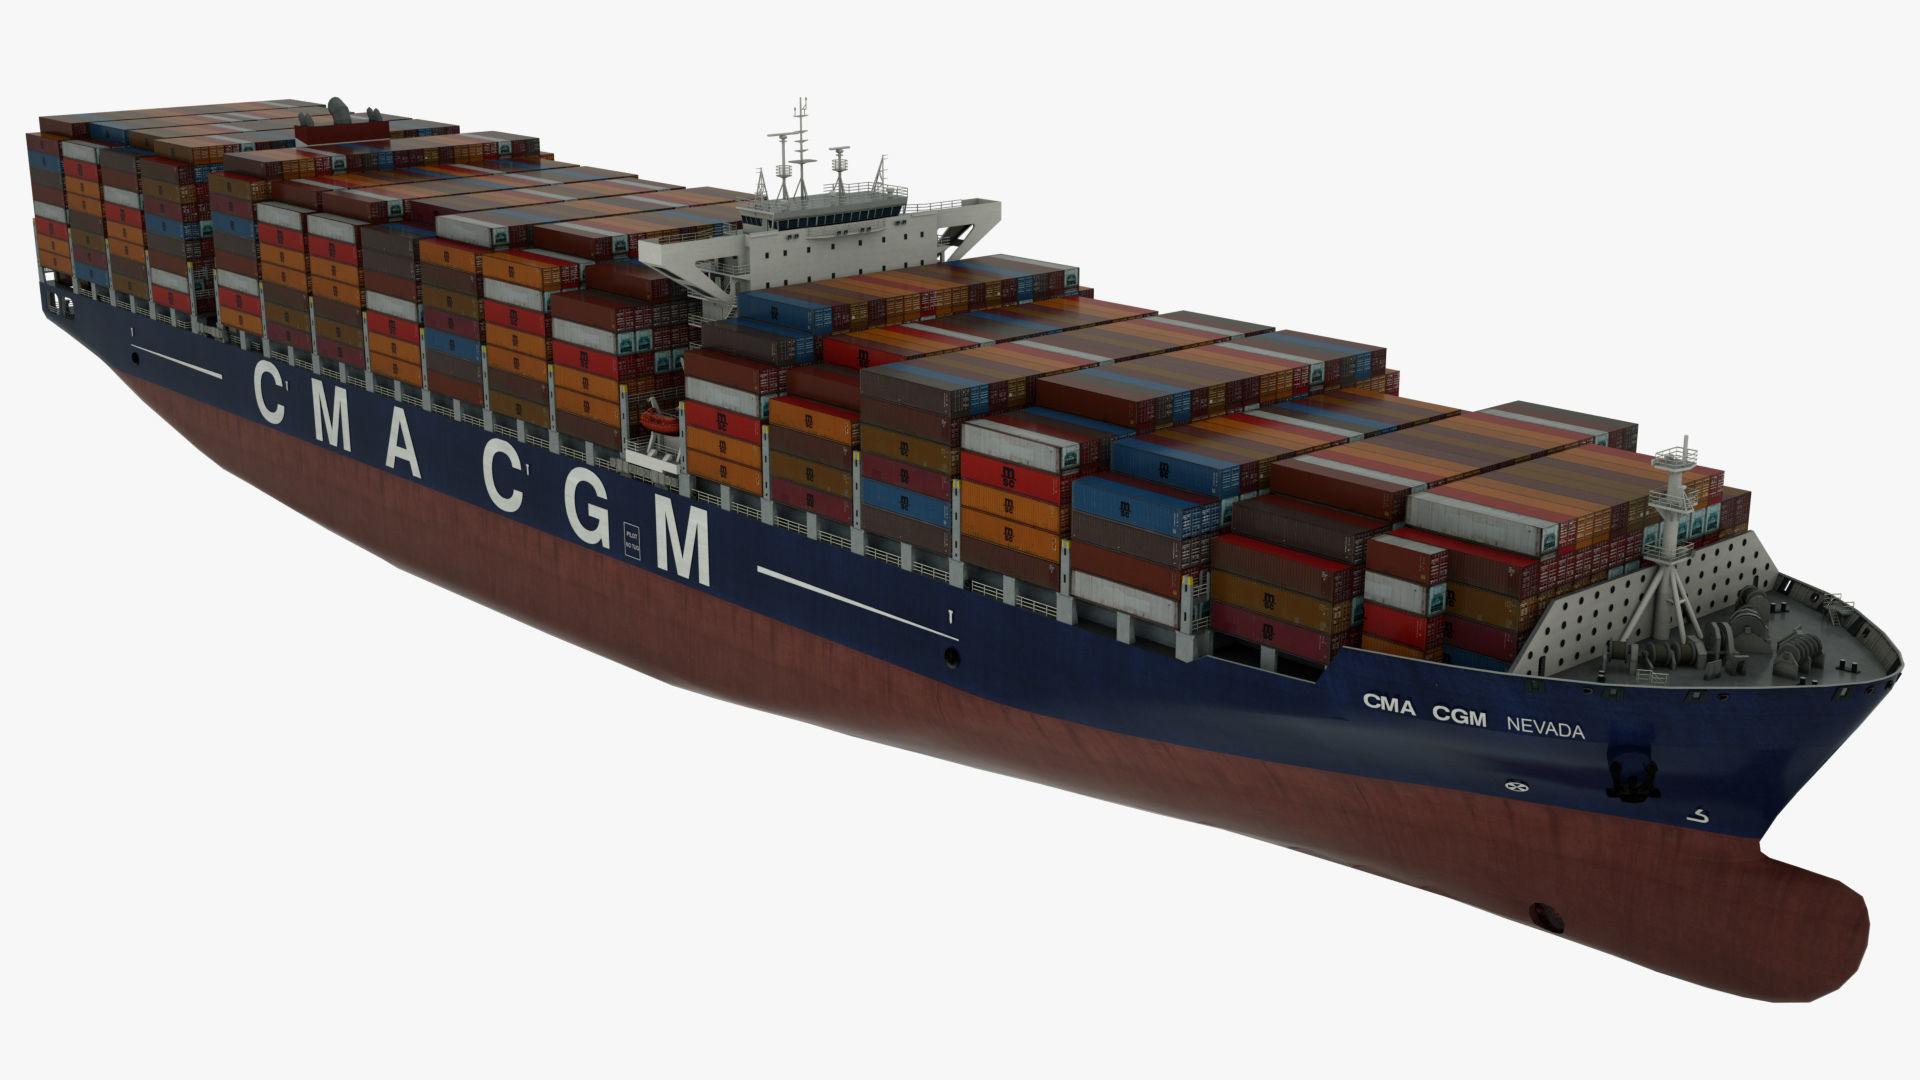 Container ship CMA Nevada